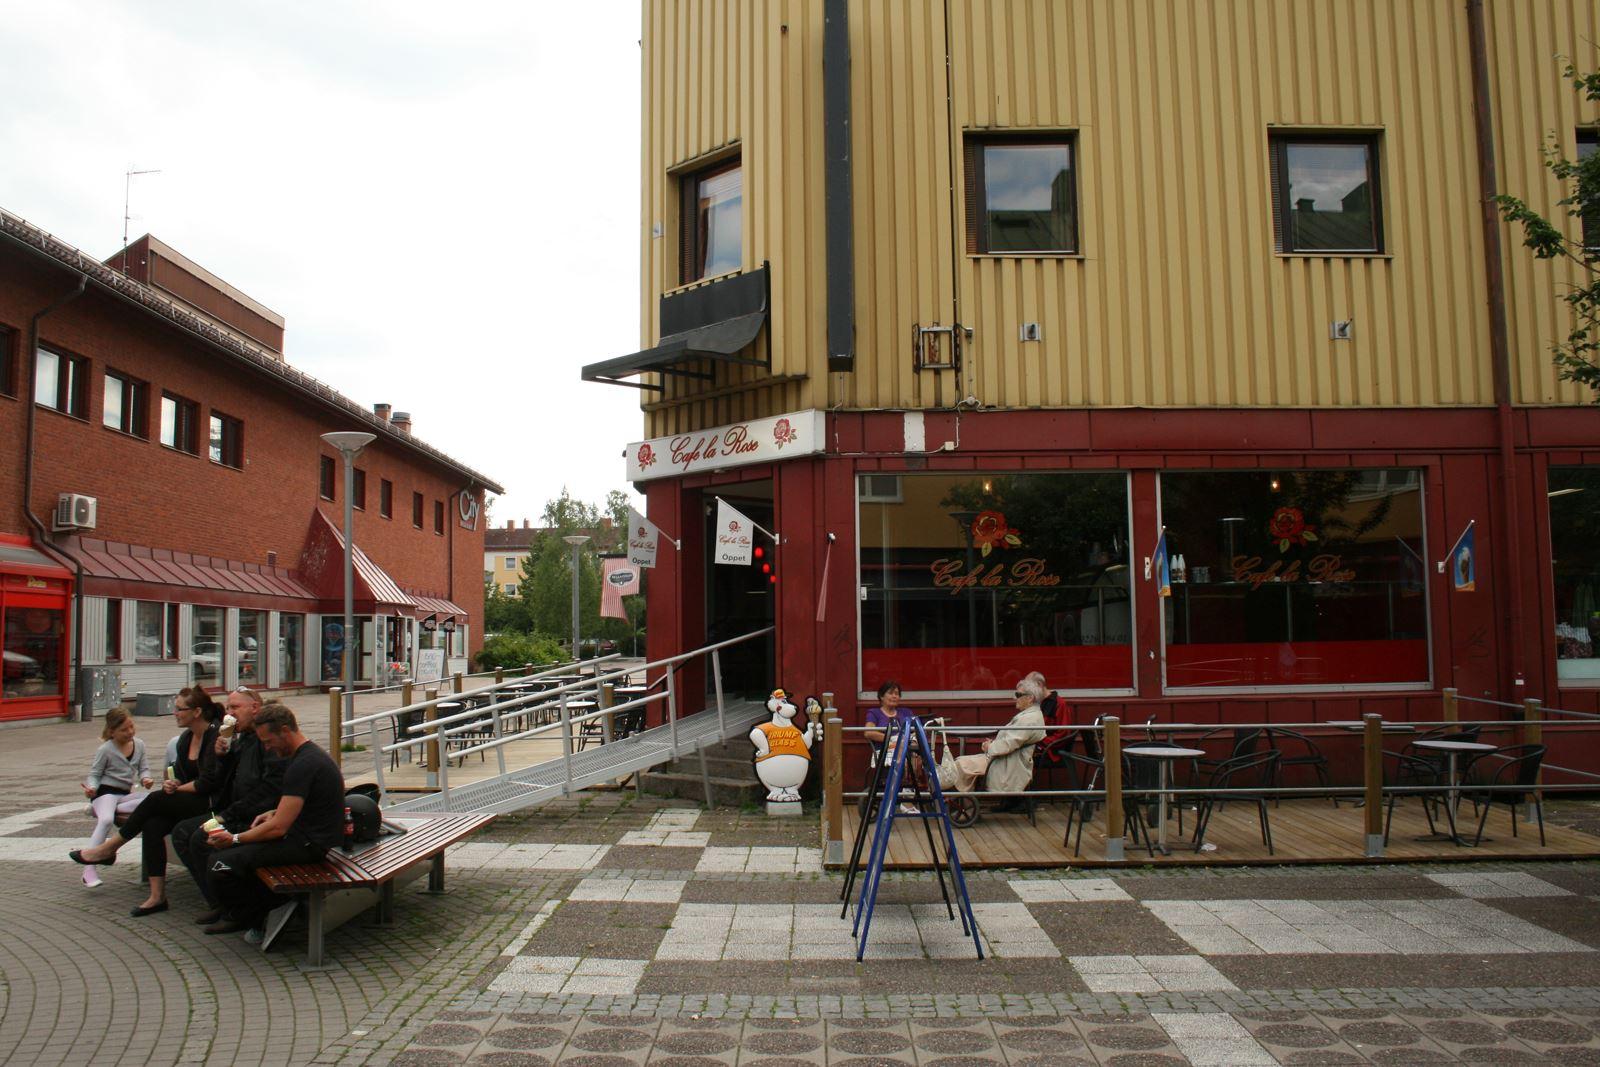 Foto: Pia R Wallner, Café de la Rosé